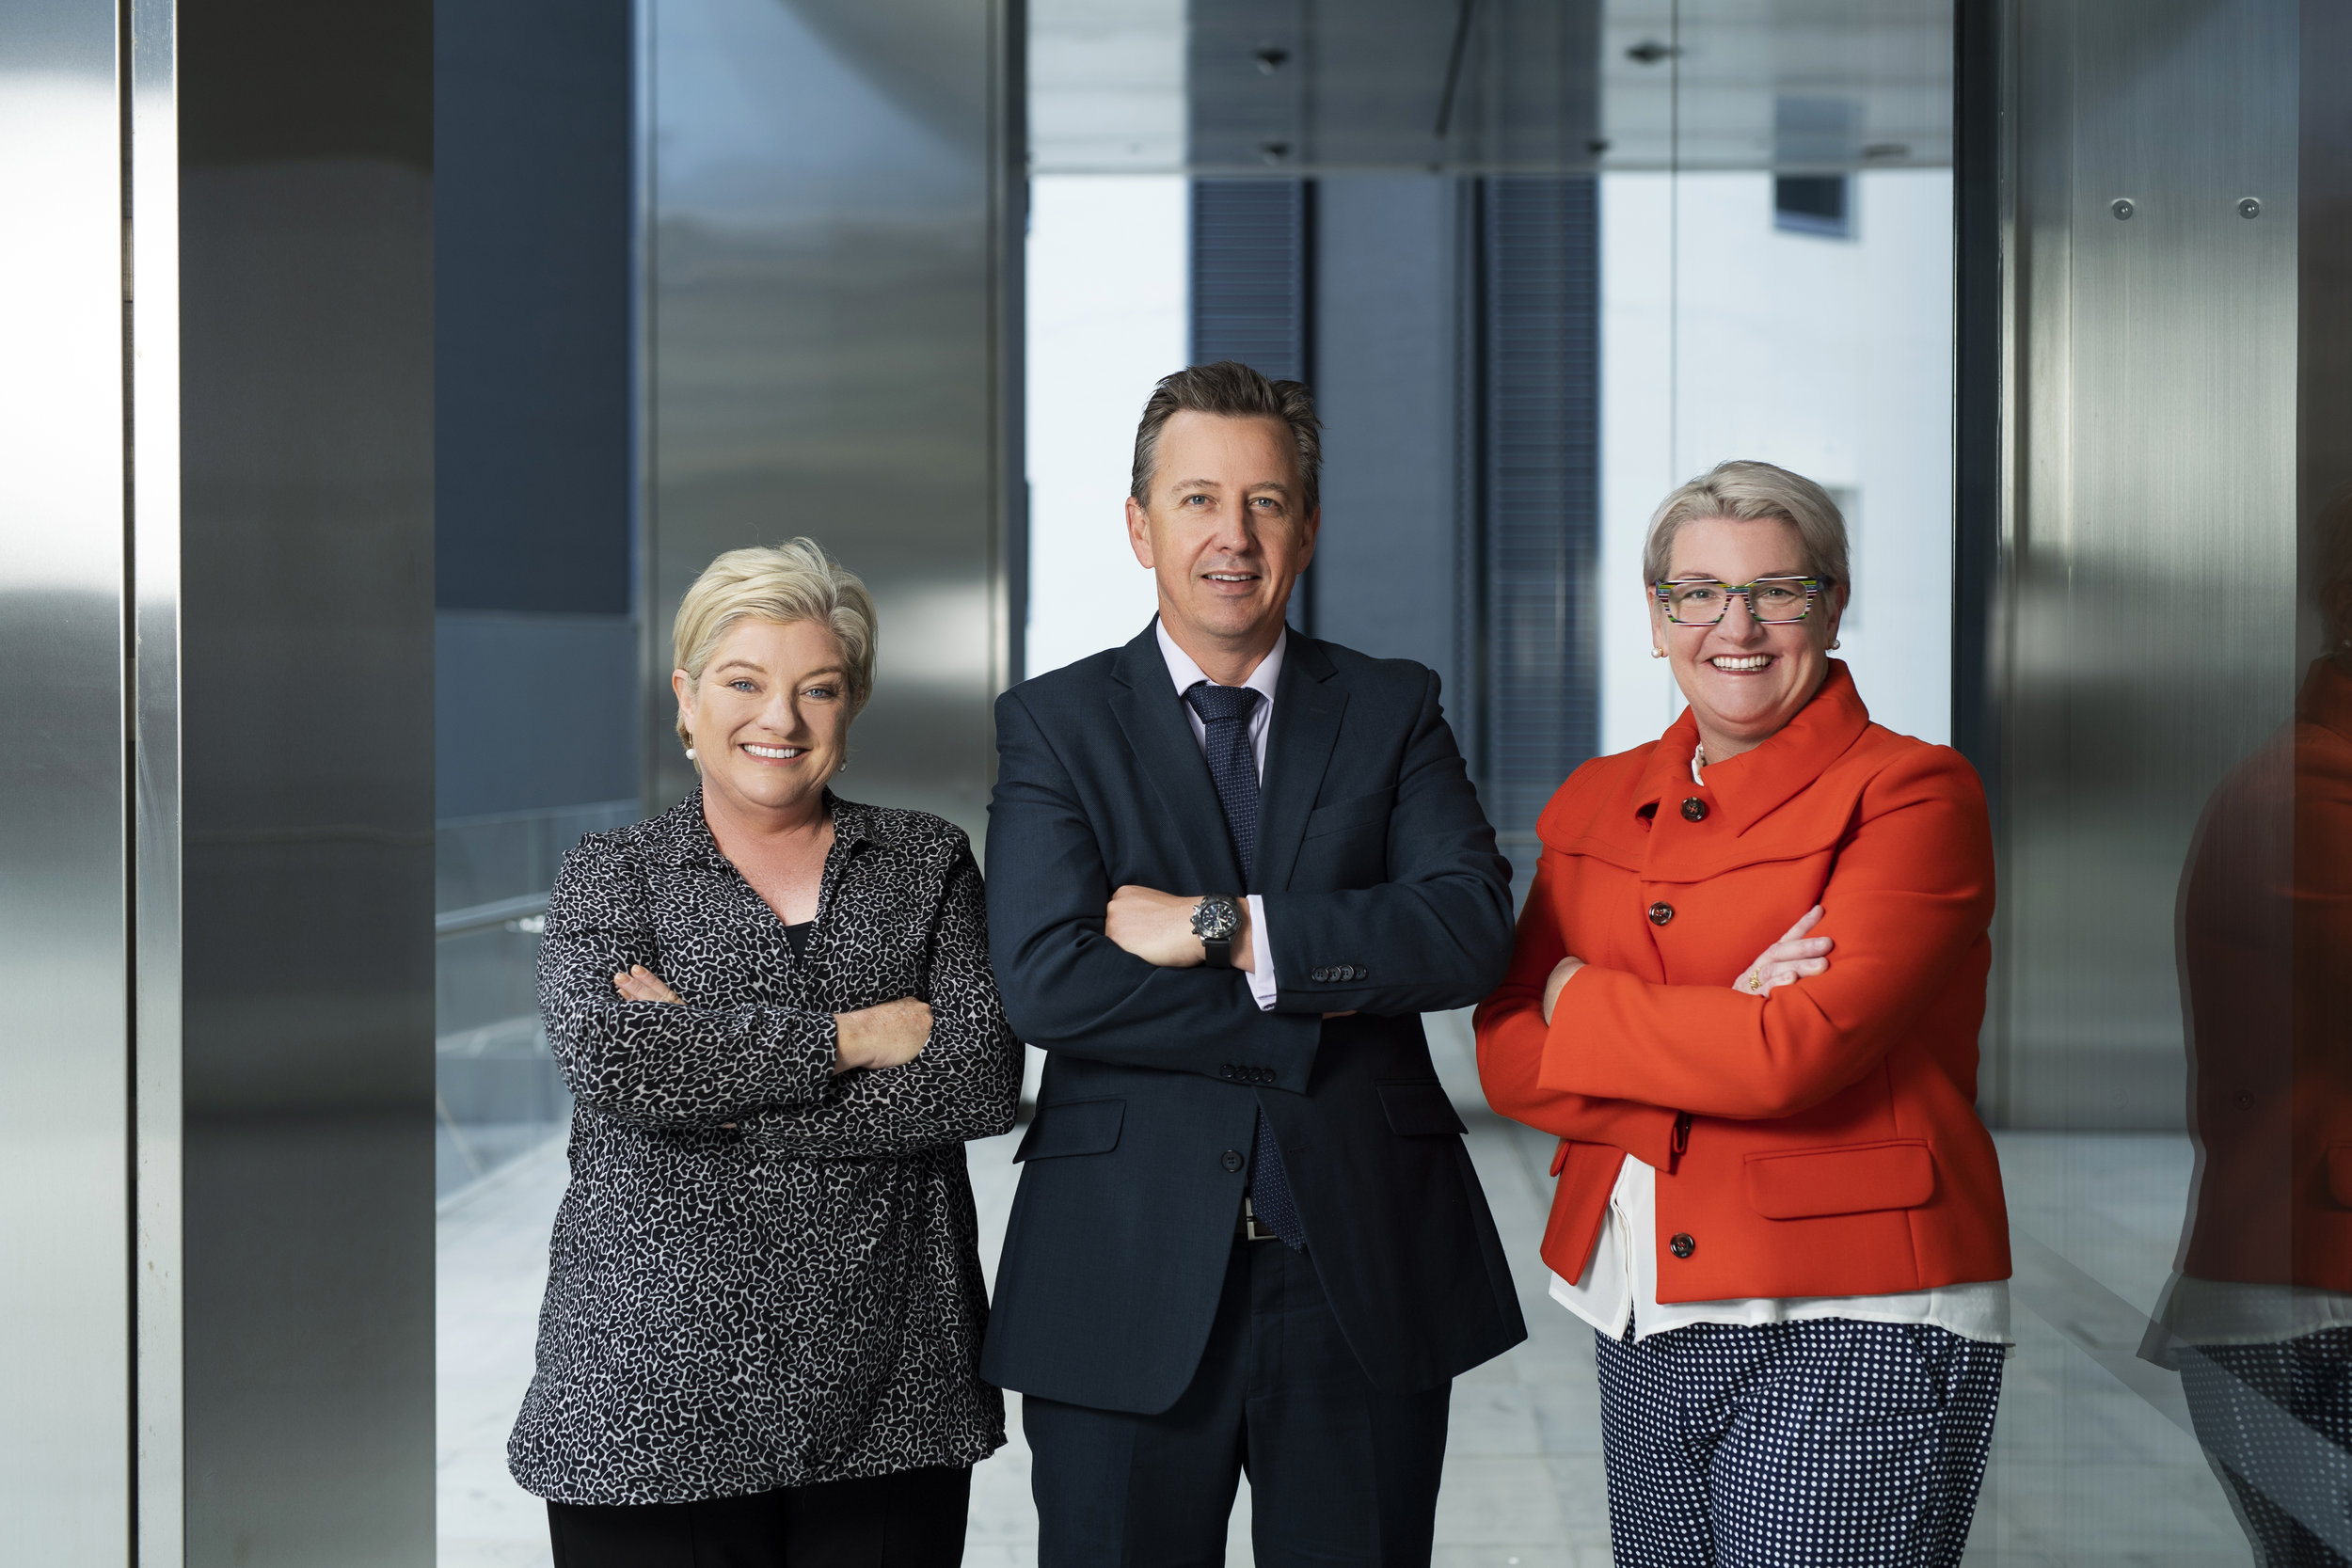 Cannings Purple Chief Executive Officer Annette Ellis, Managing Director Warrick Hazeldine and new Queensland State Director Peta Baldwin.